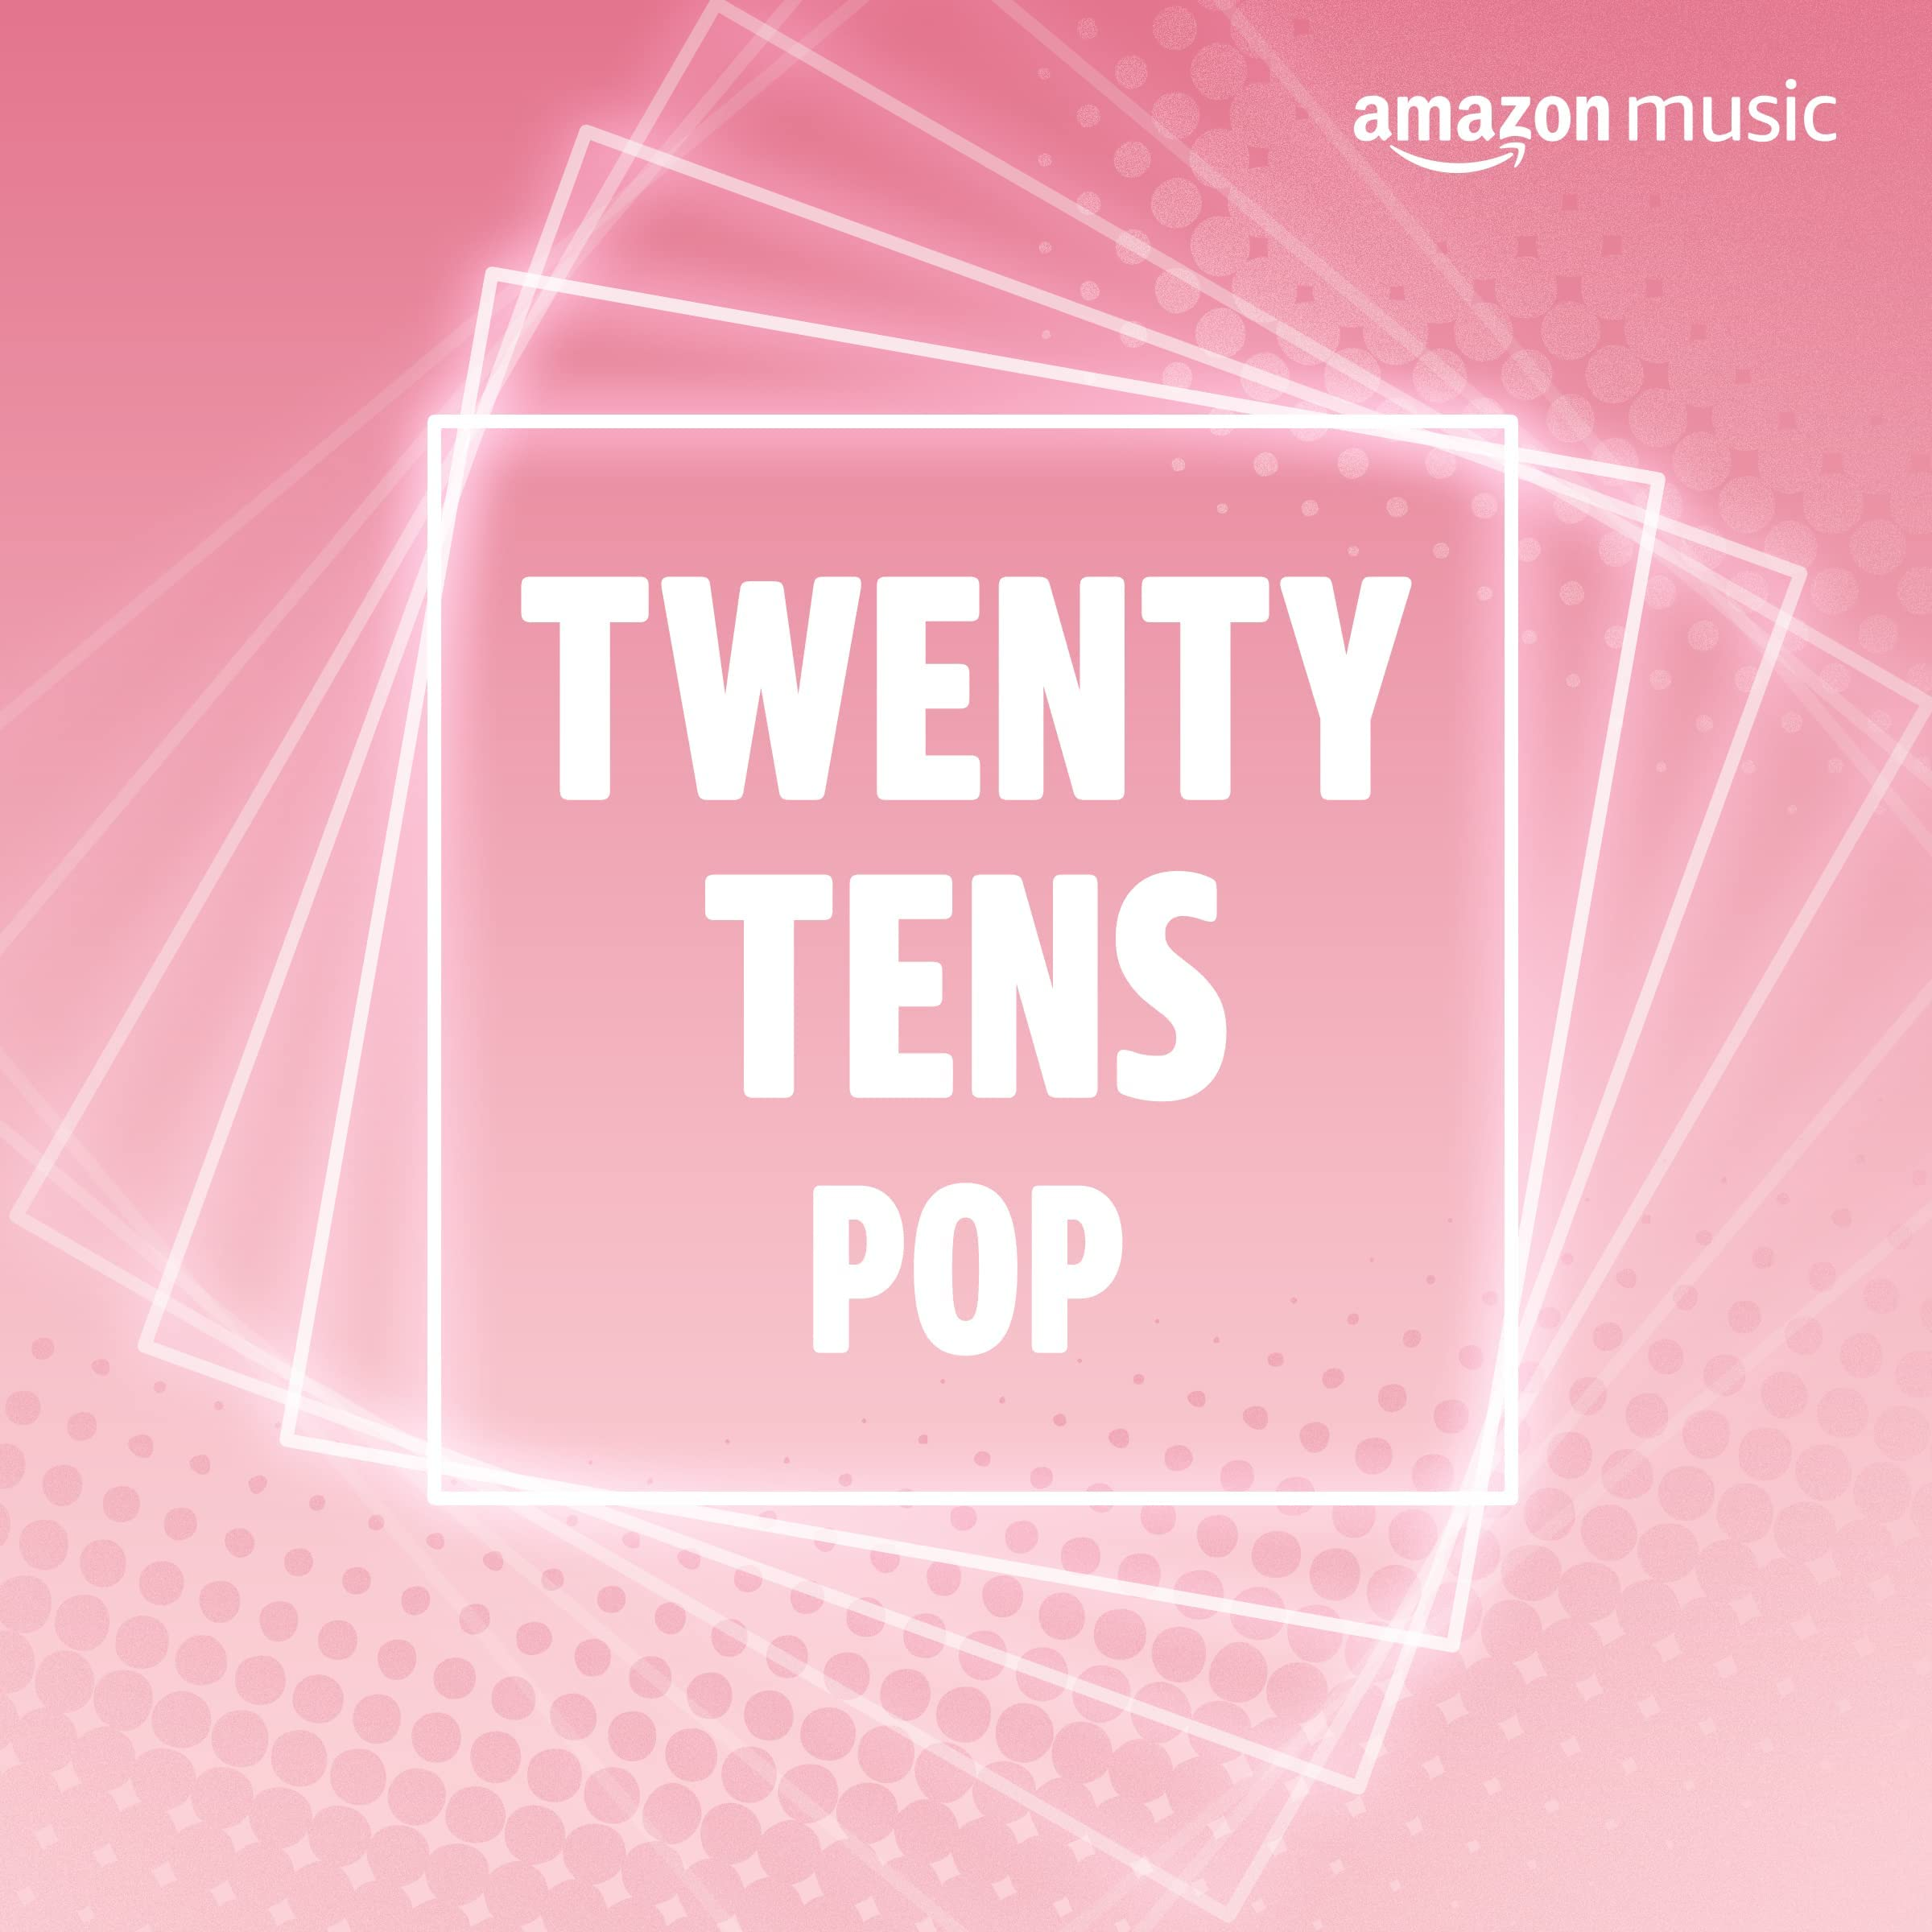 Twenty Tens Pop